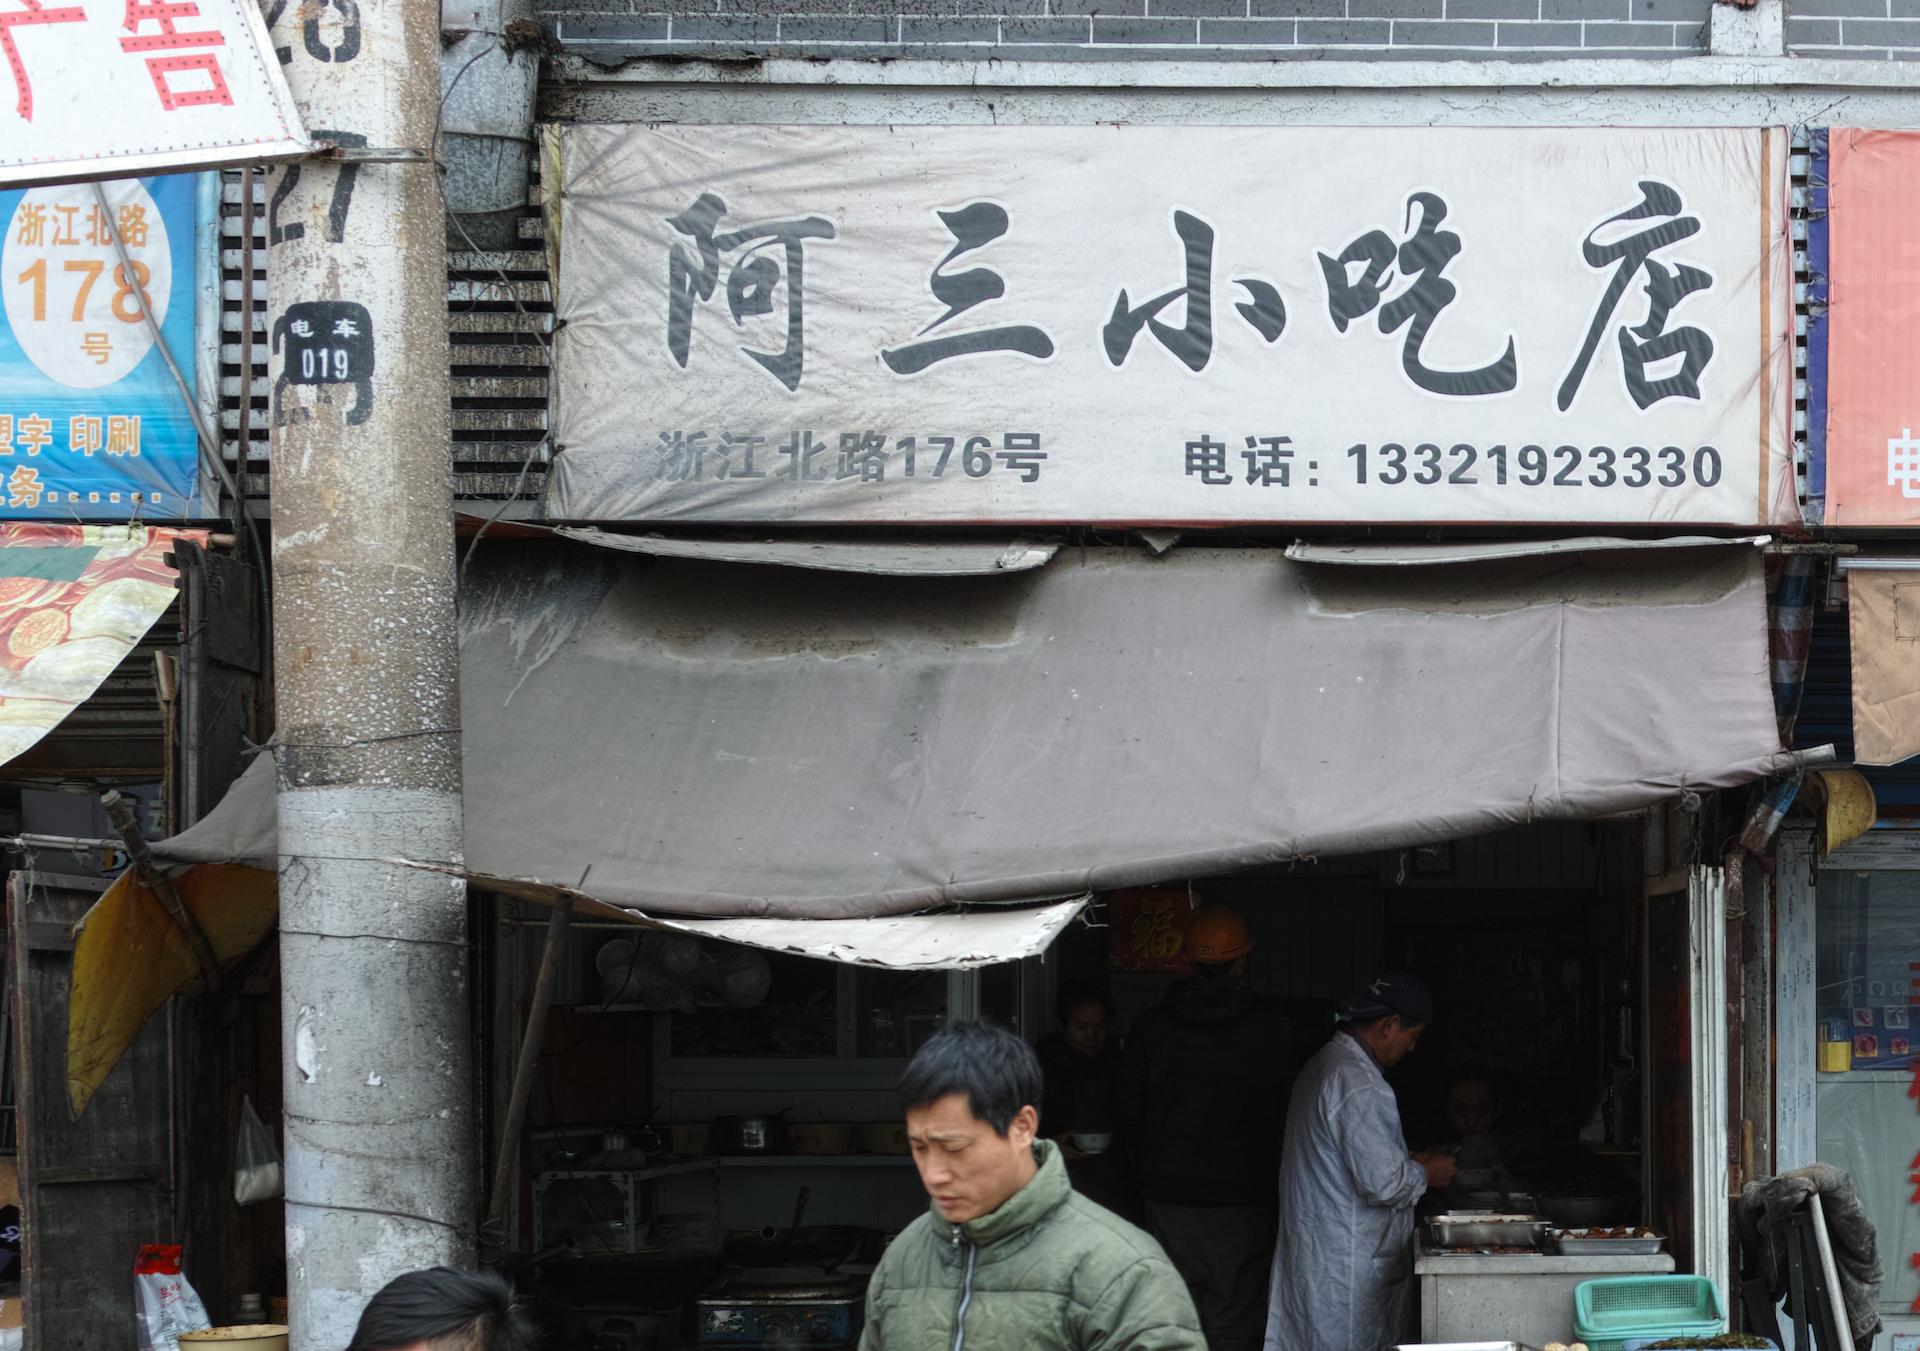 urbansign-3 xingkai